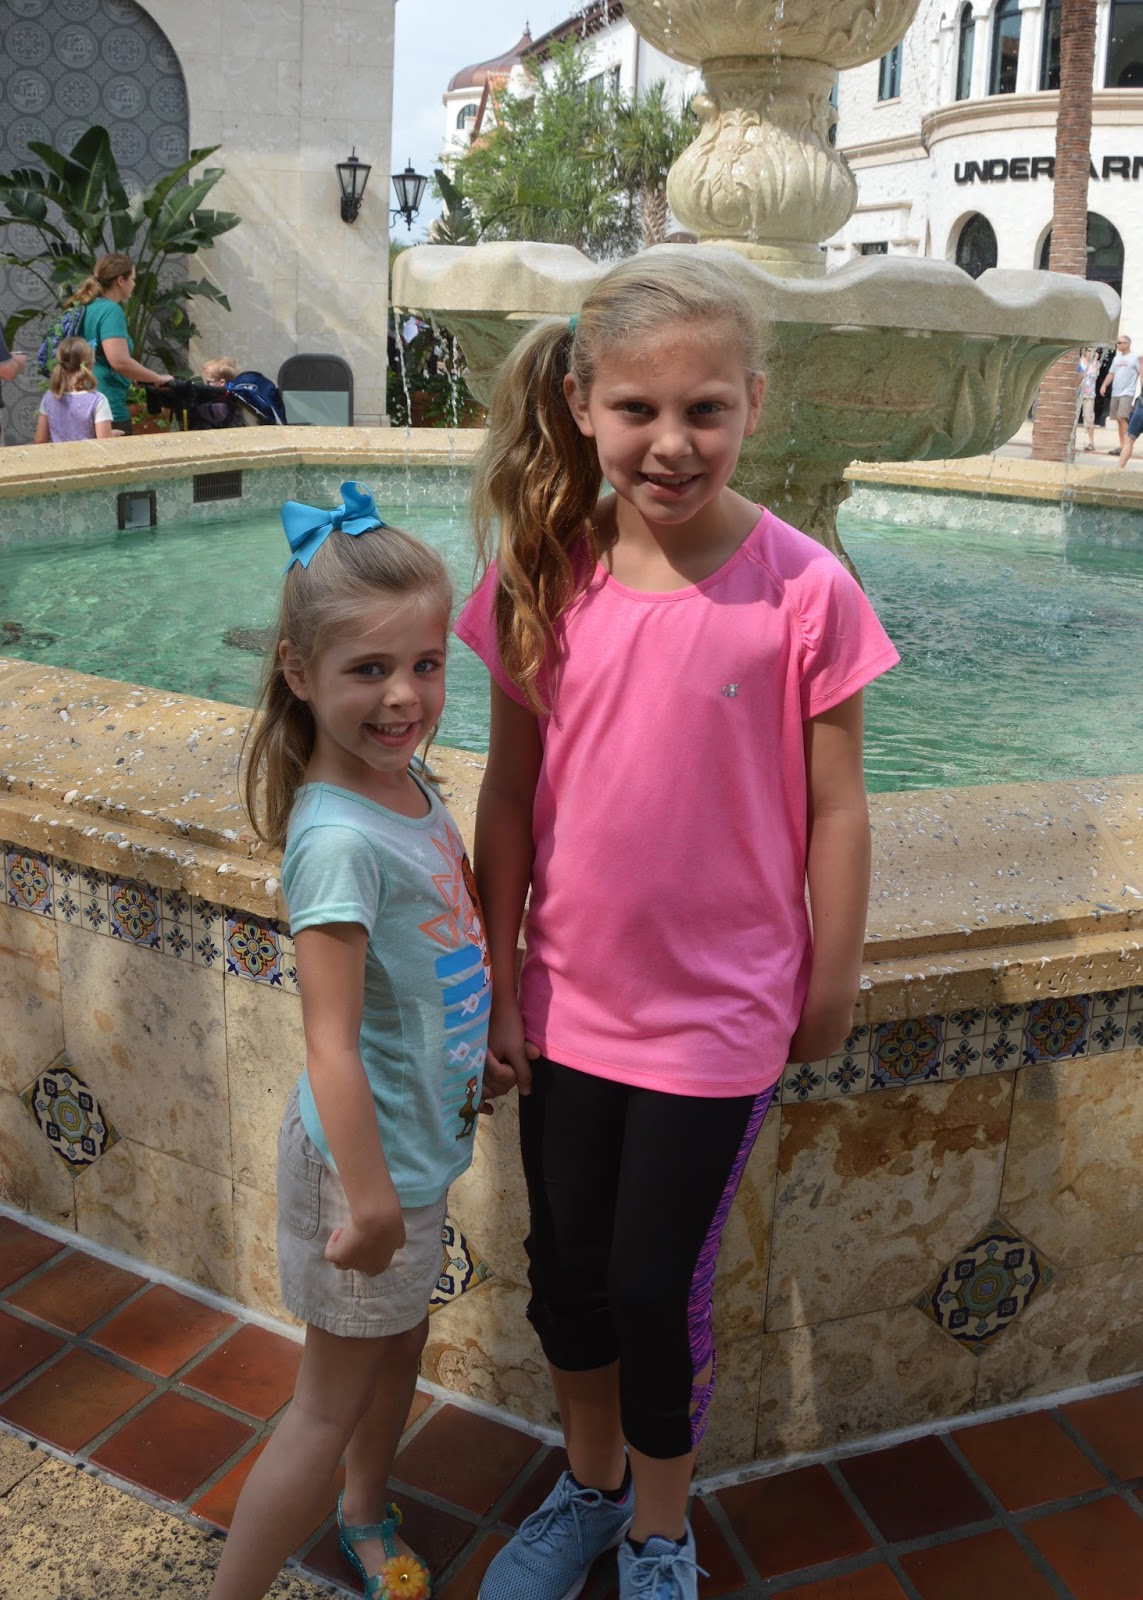 Parker Family Trip 2017: Disney Springs